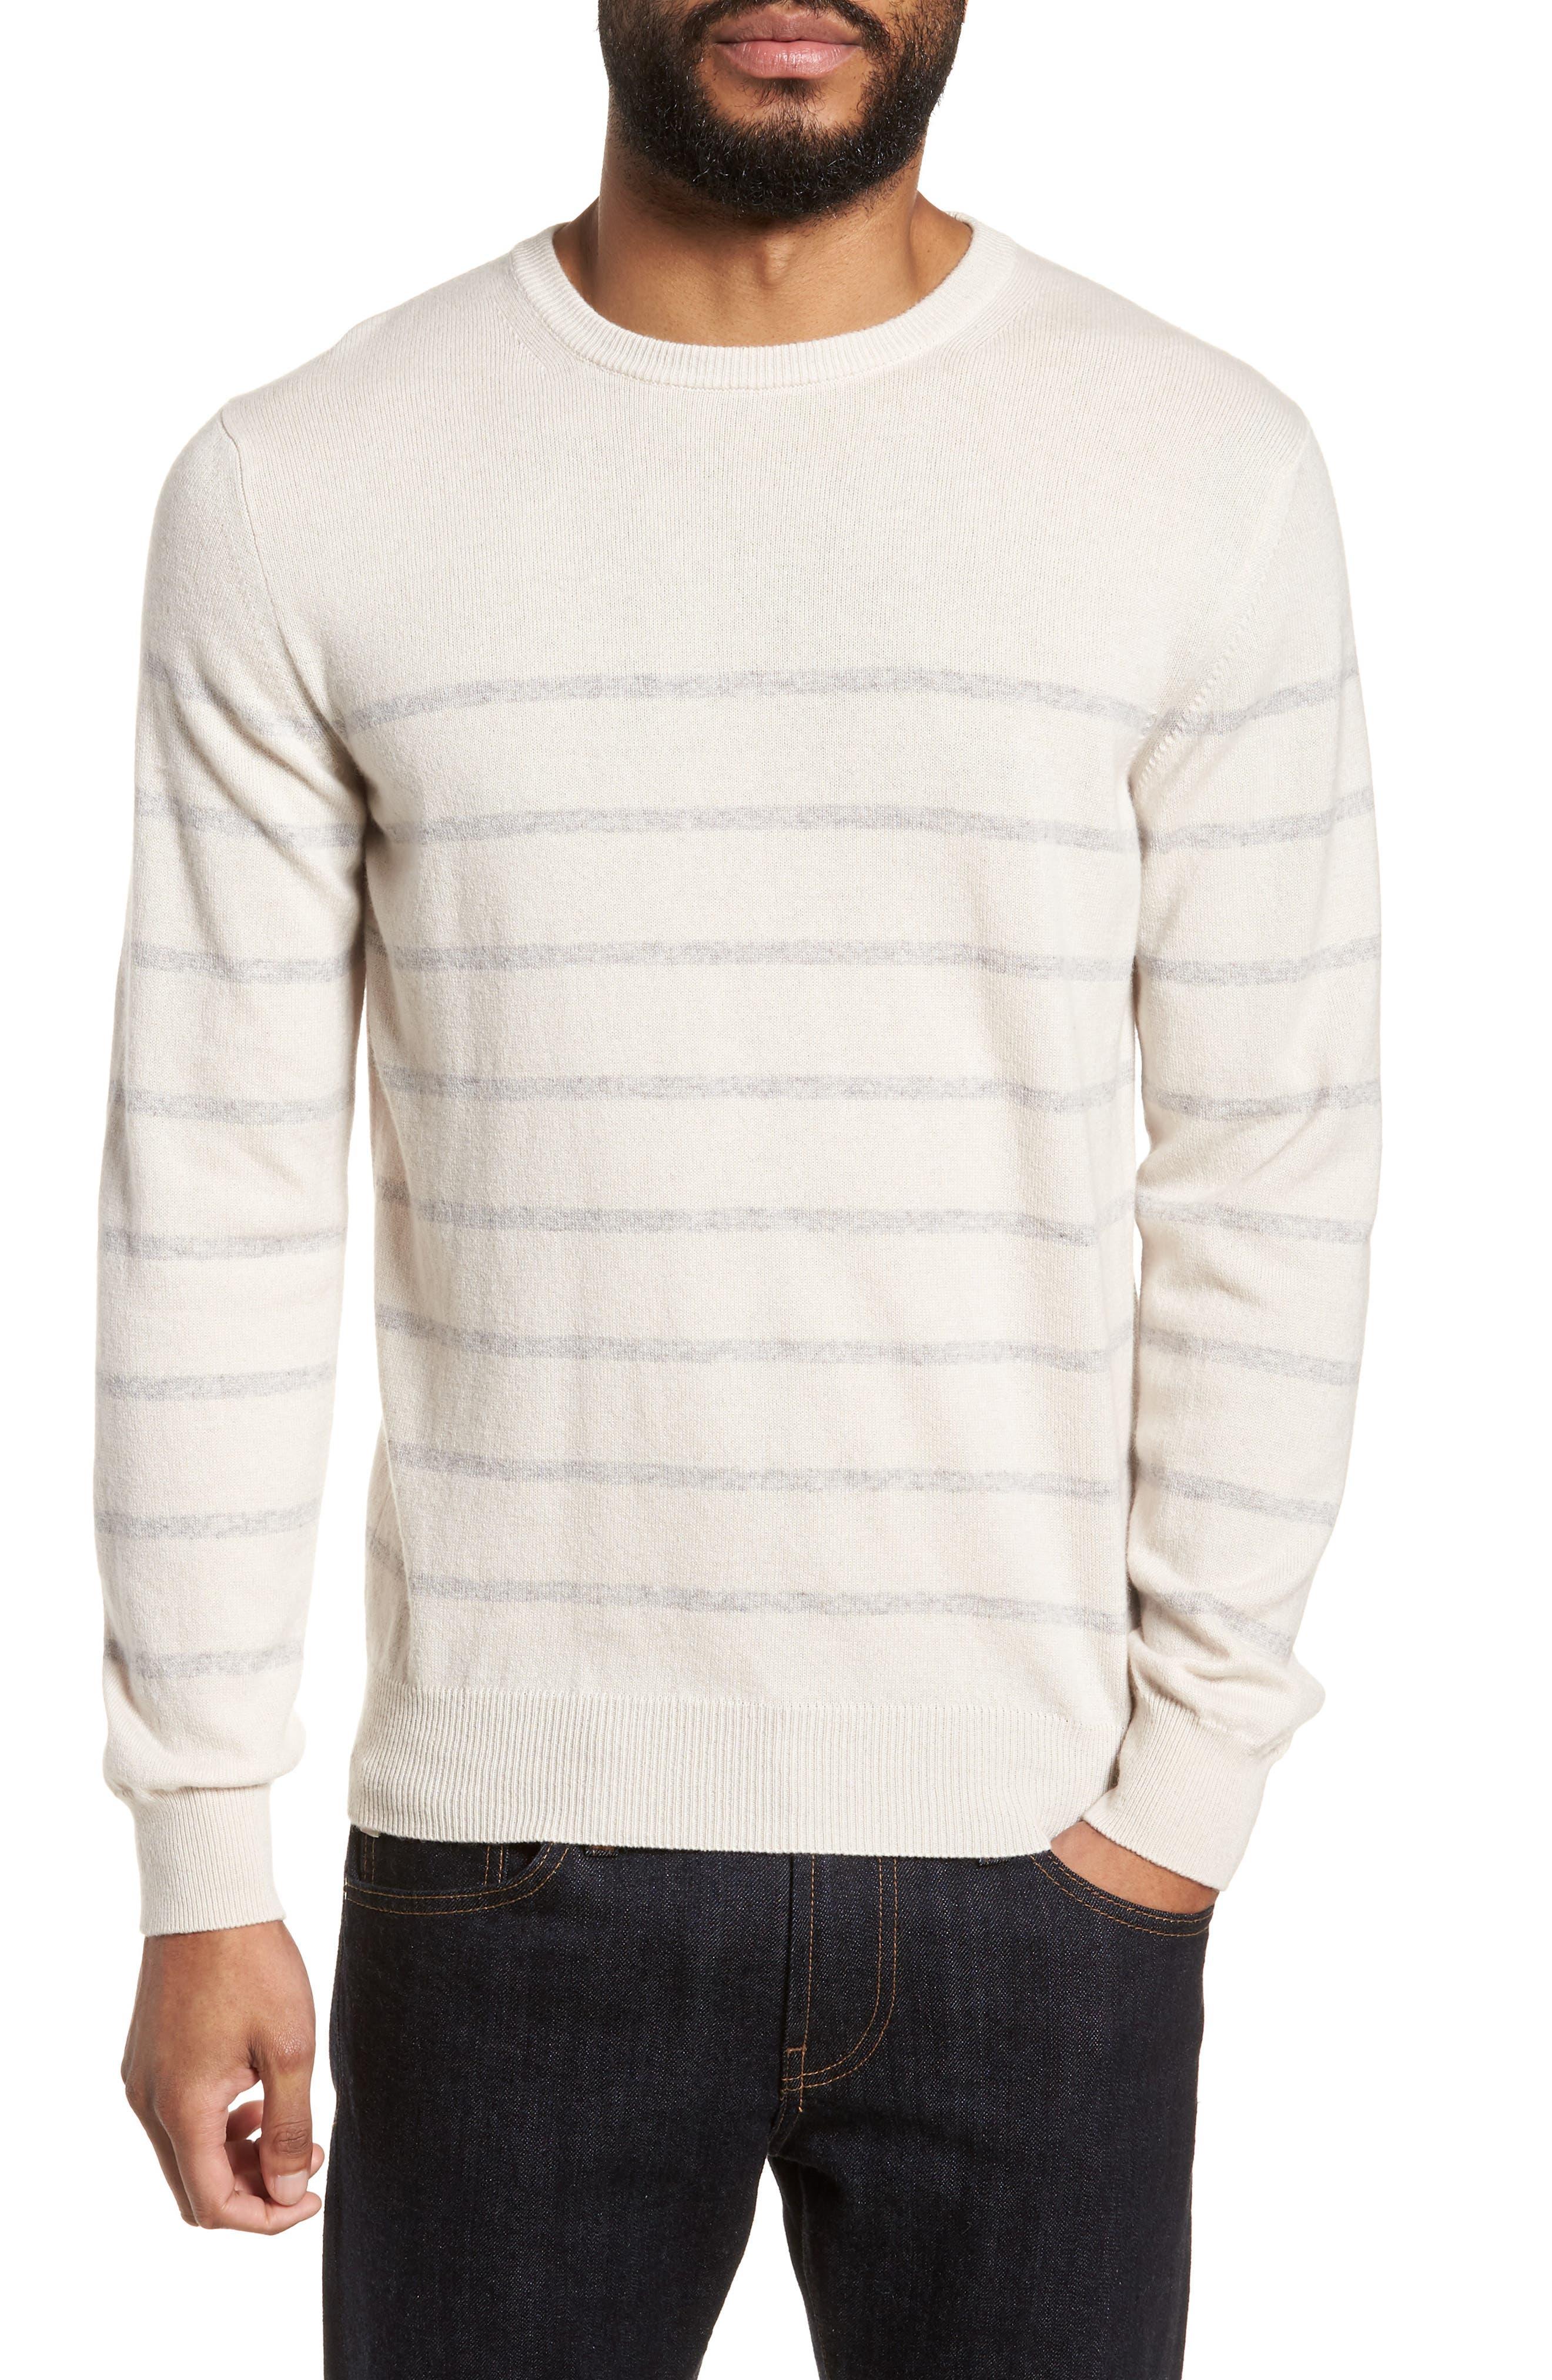 Cashmere Crewneck Sweater,                             Main thumbnail 1, color,                             102